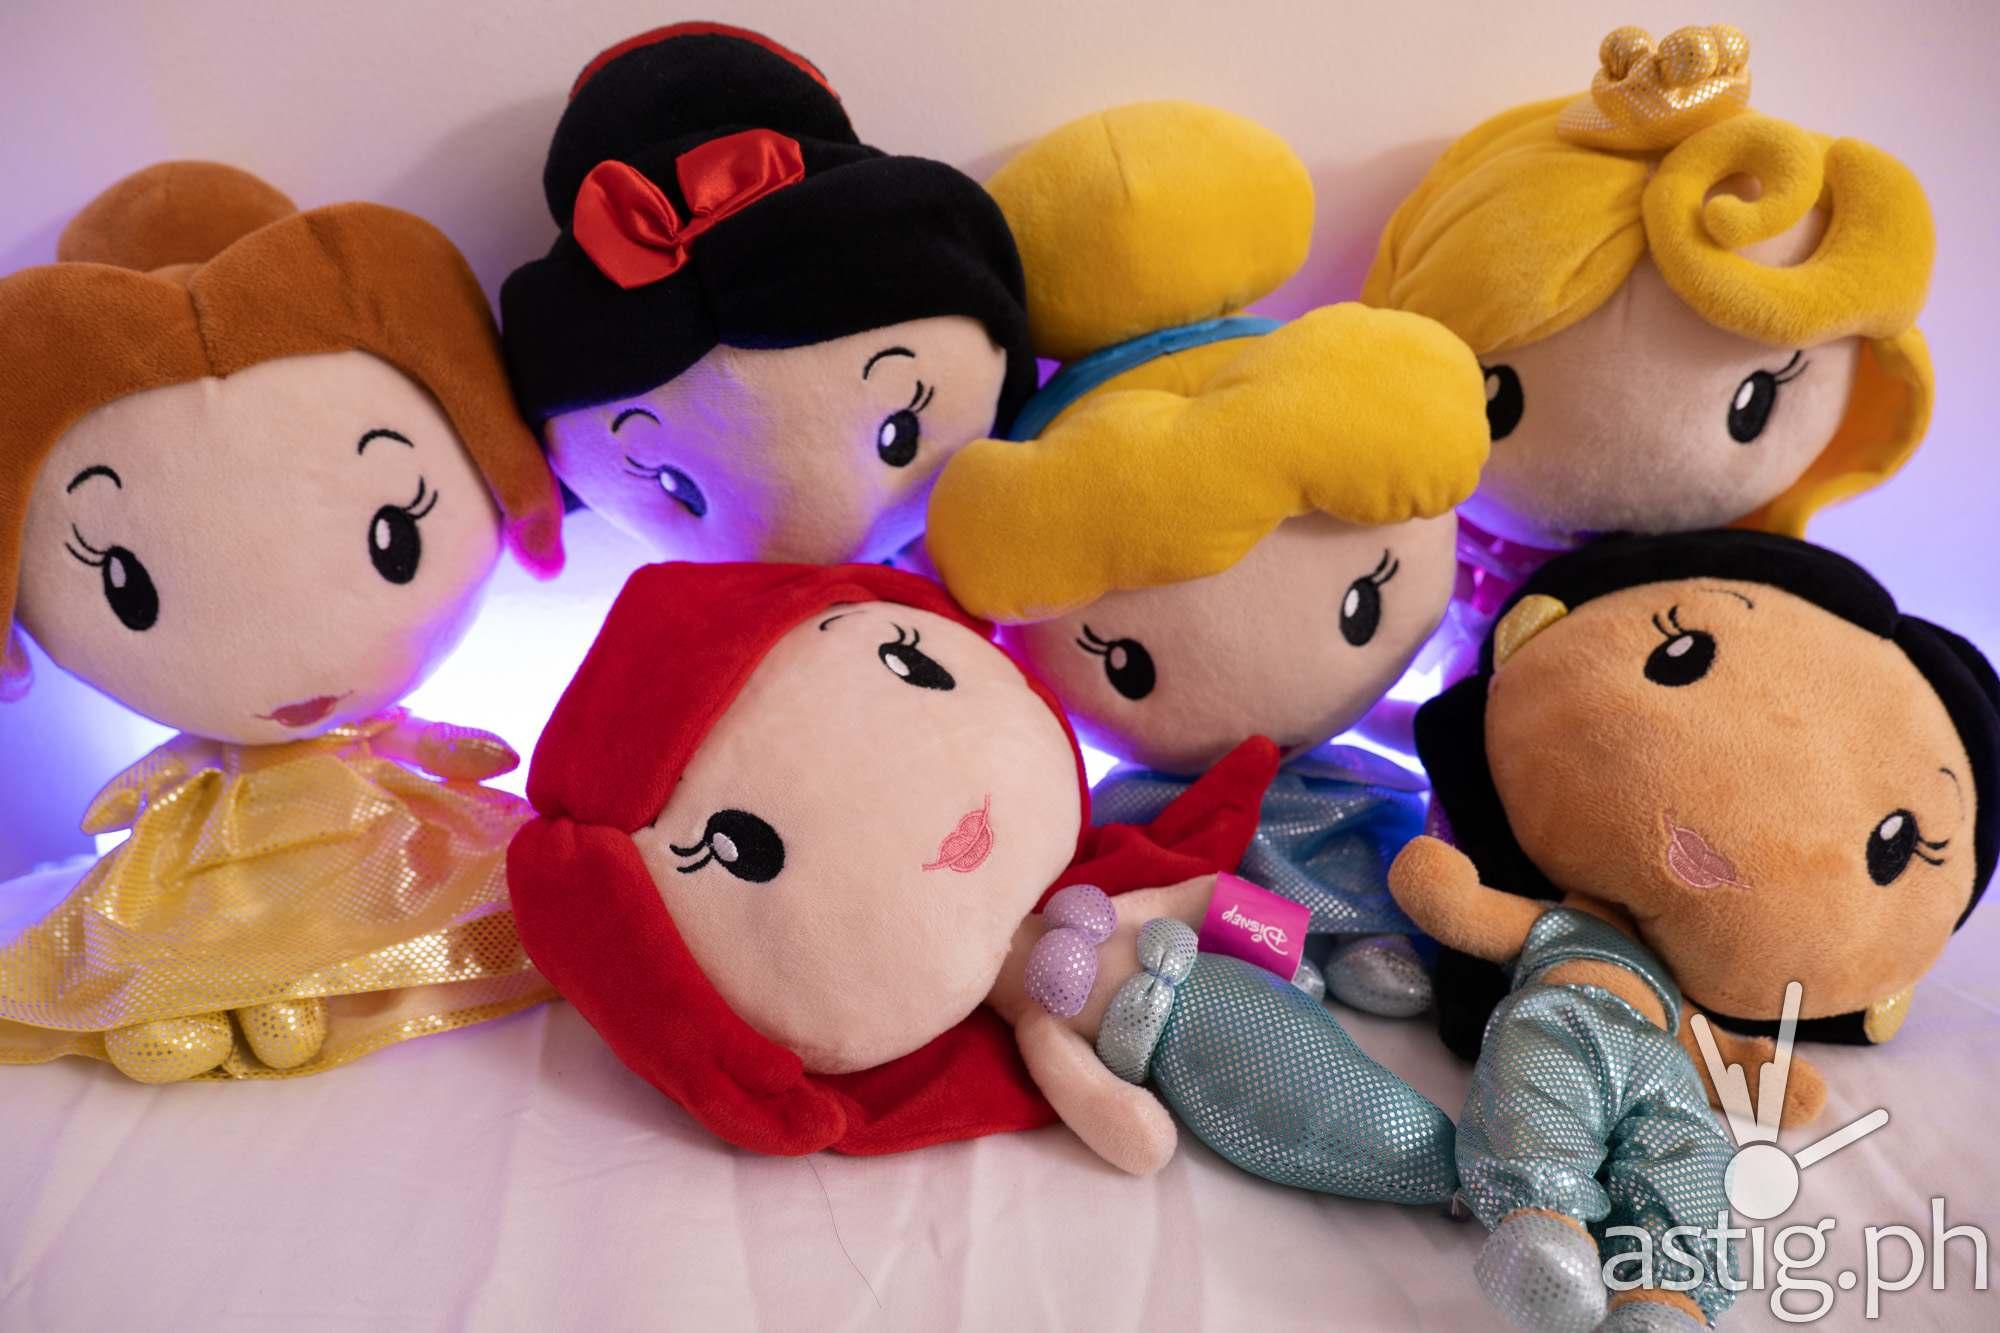 Disney Princess plush doll set